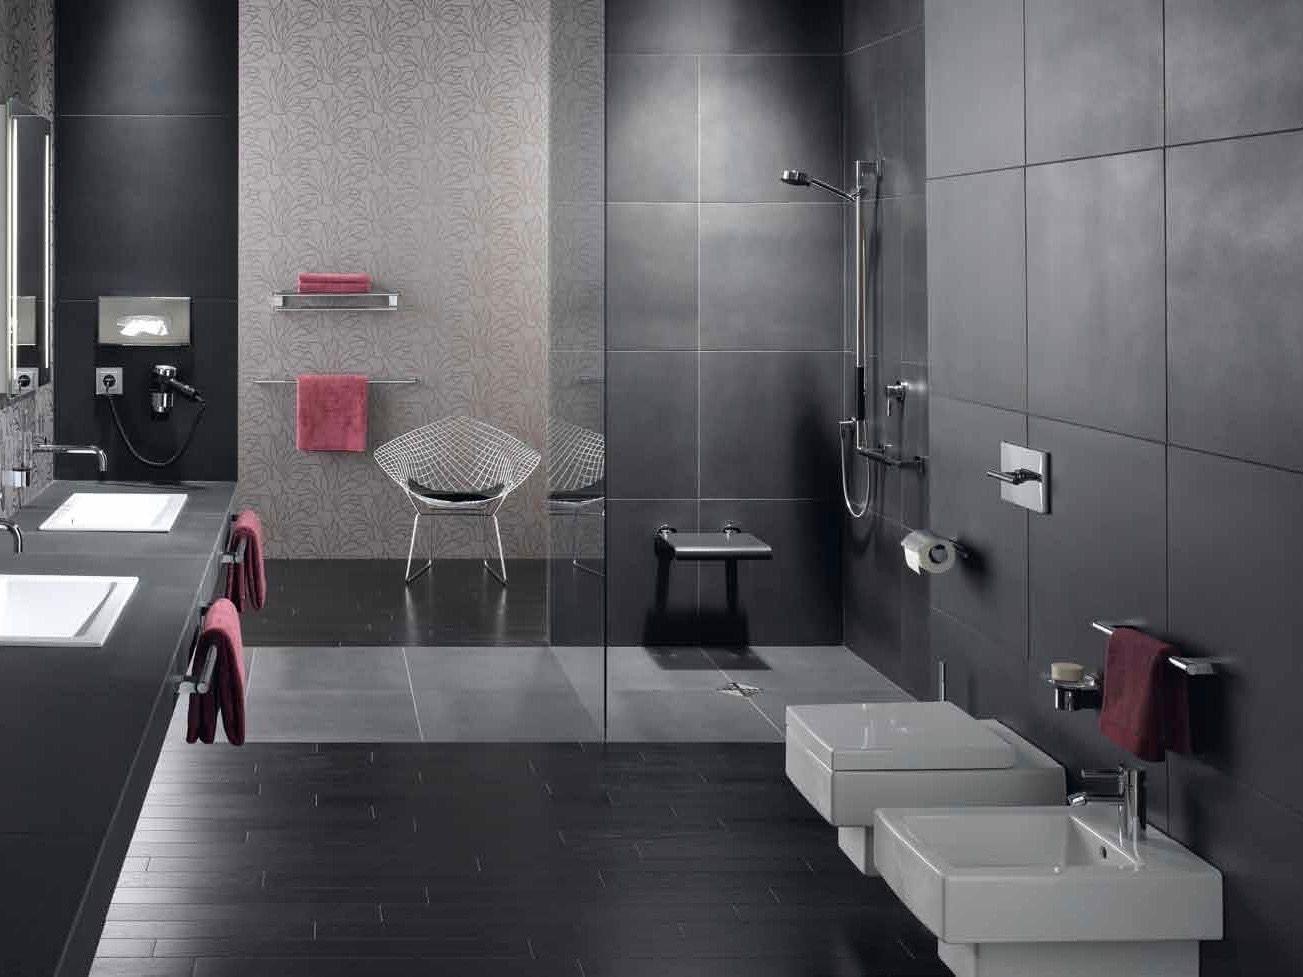 accessoires f rs wc. Black Bedroom Furniture Sets. Home Design Ideas